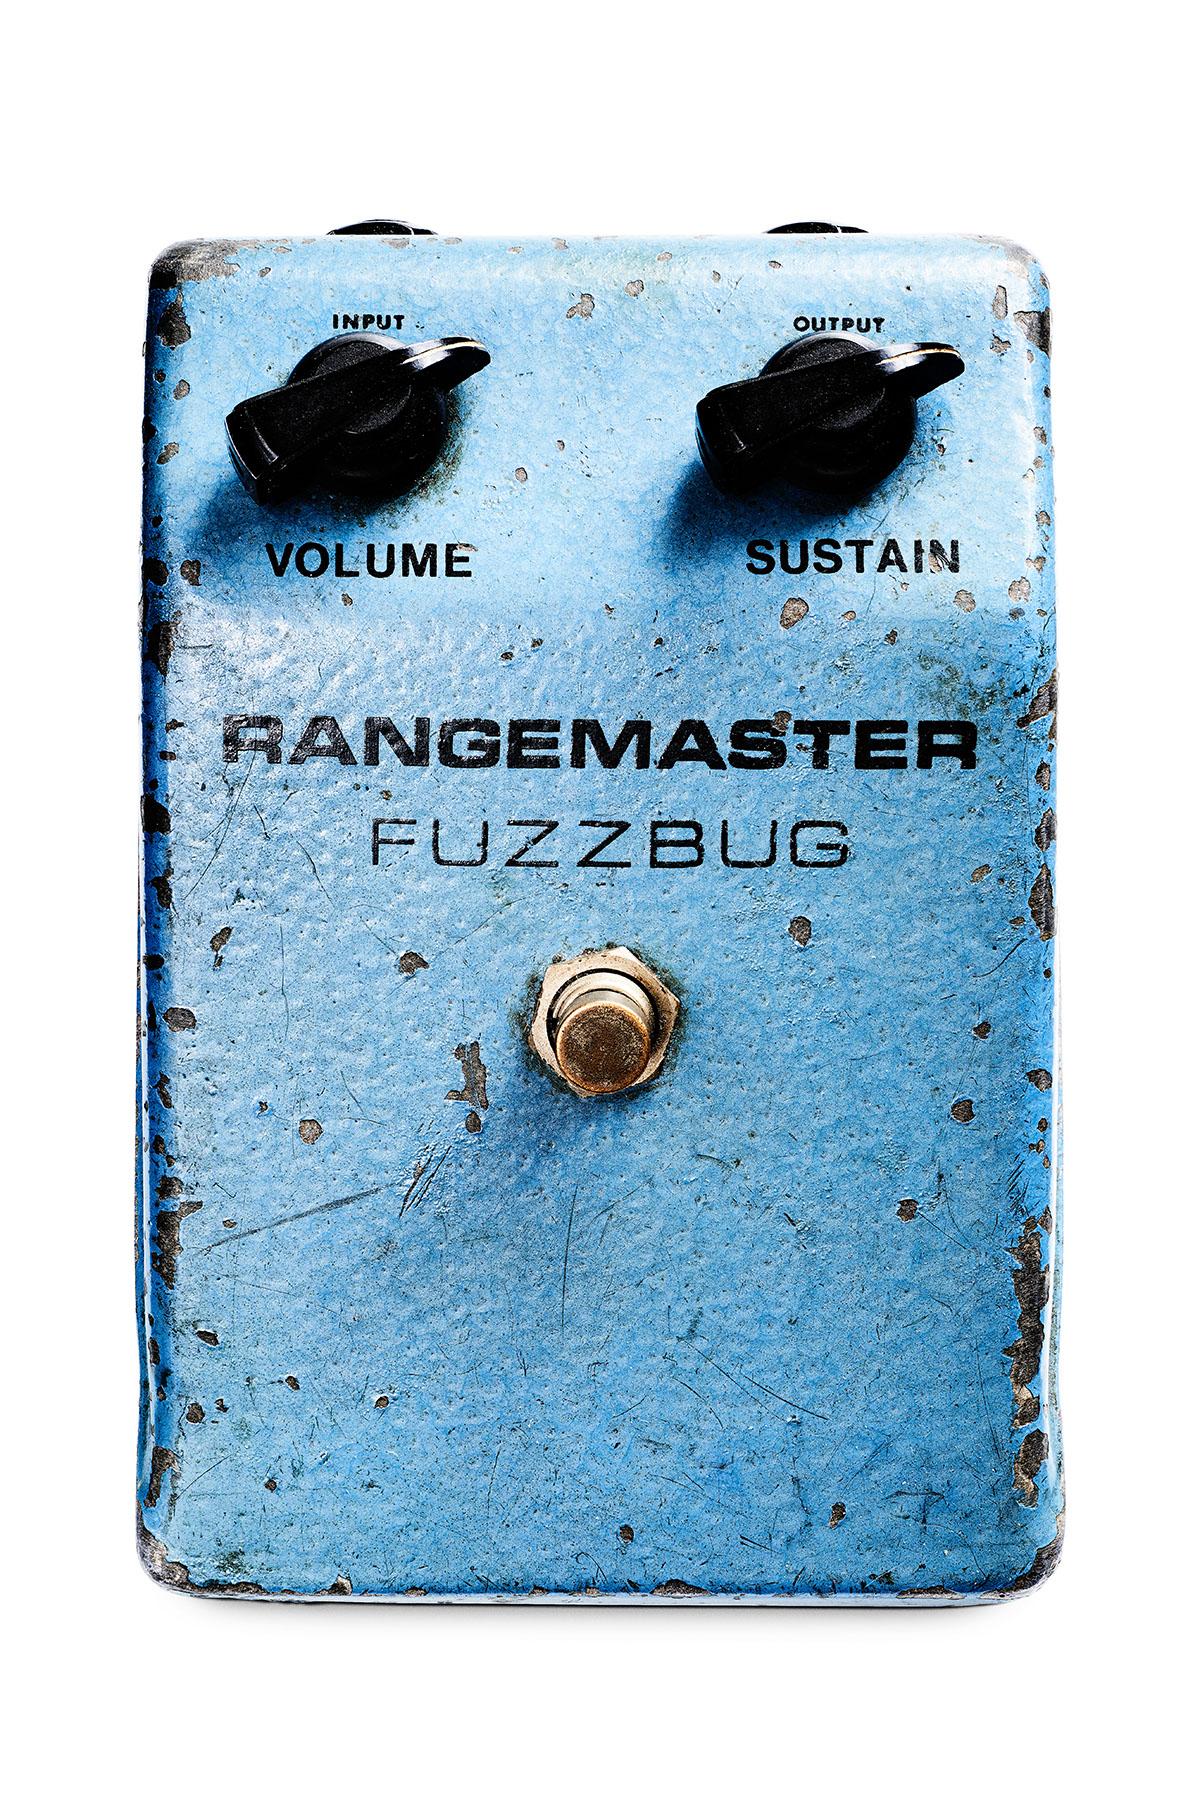 Rangemaster Fuzzbug